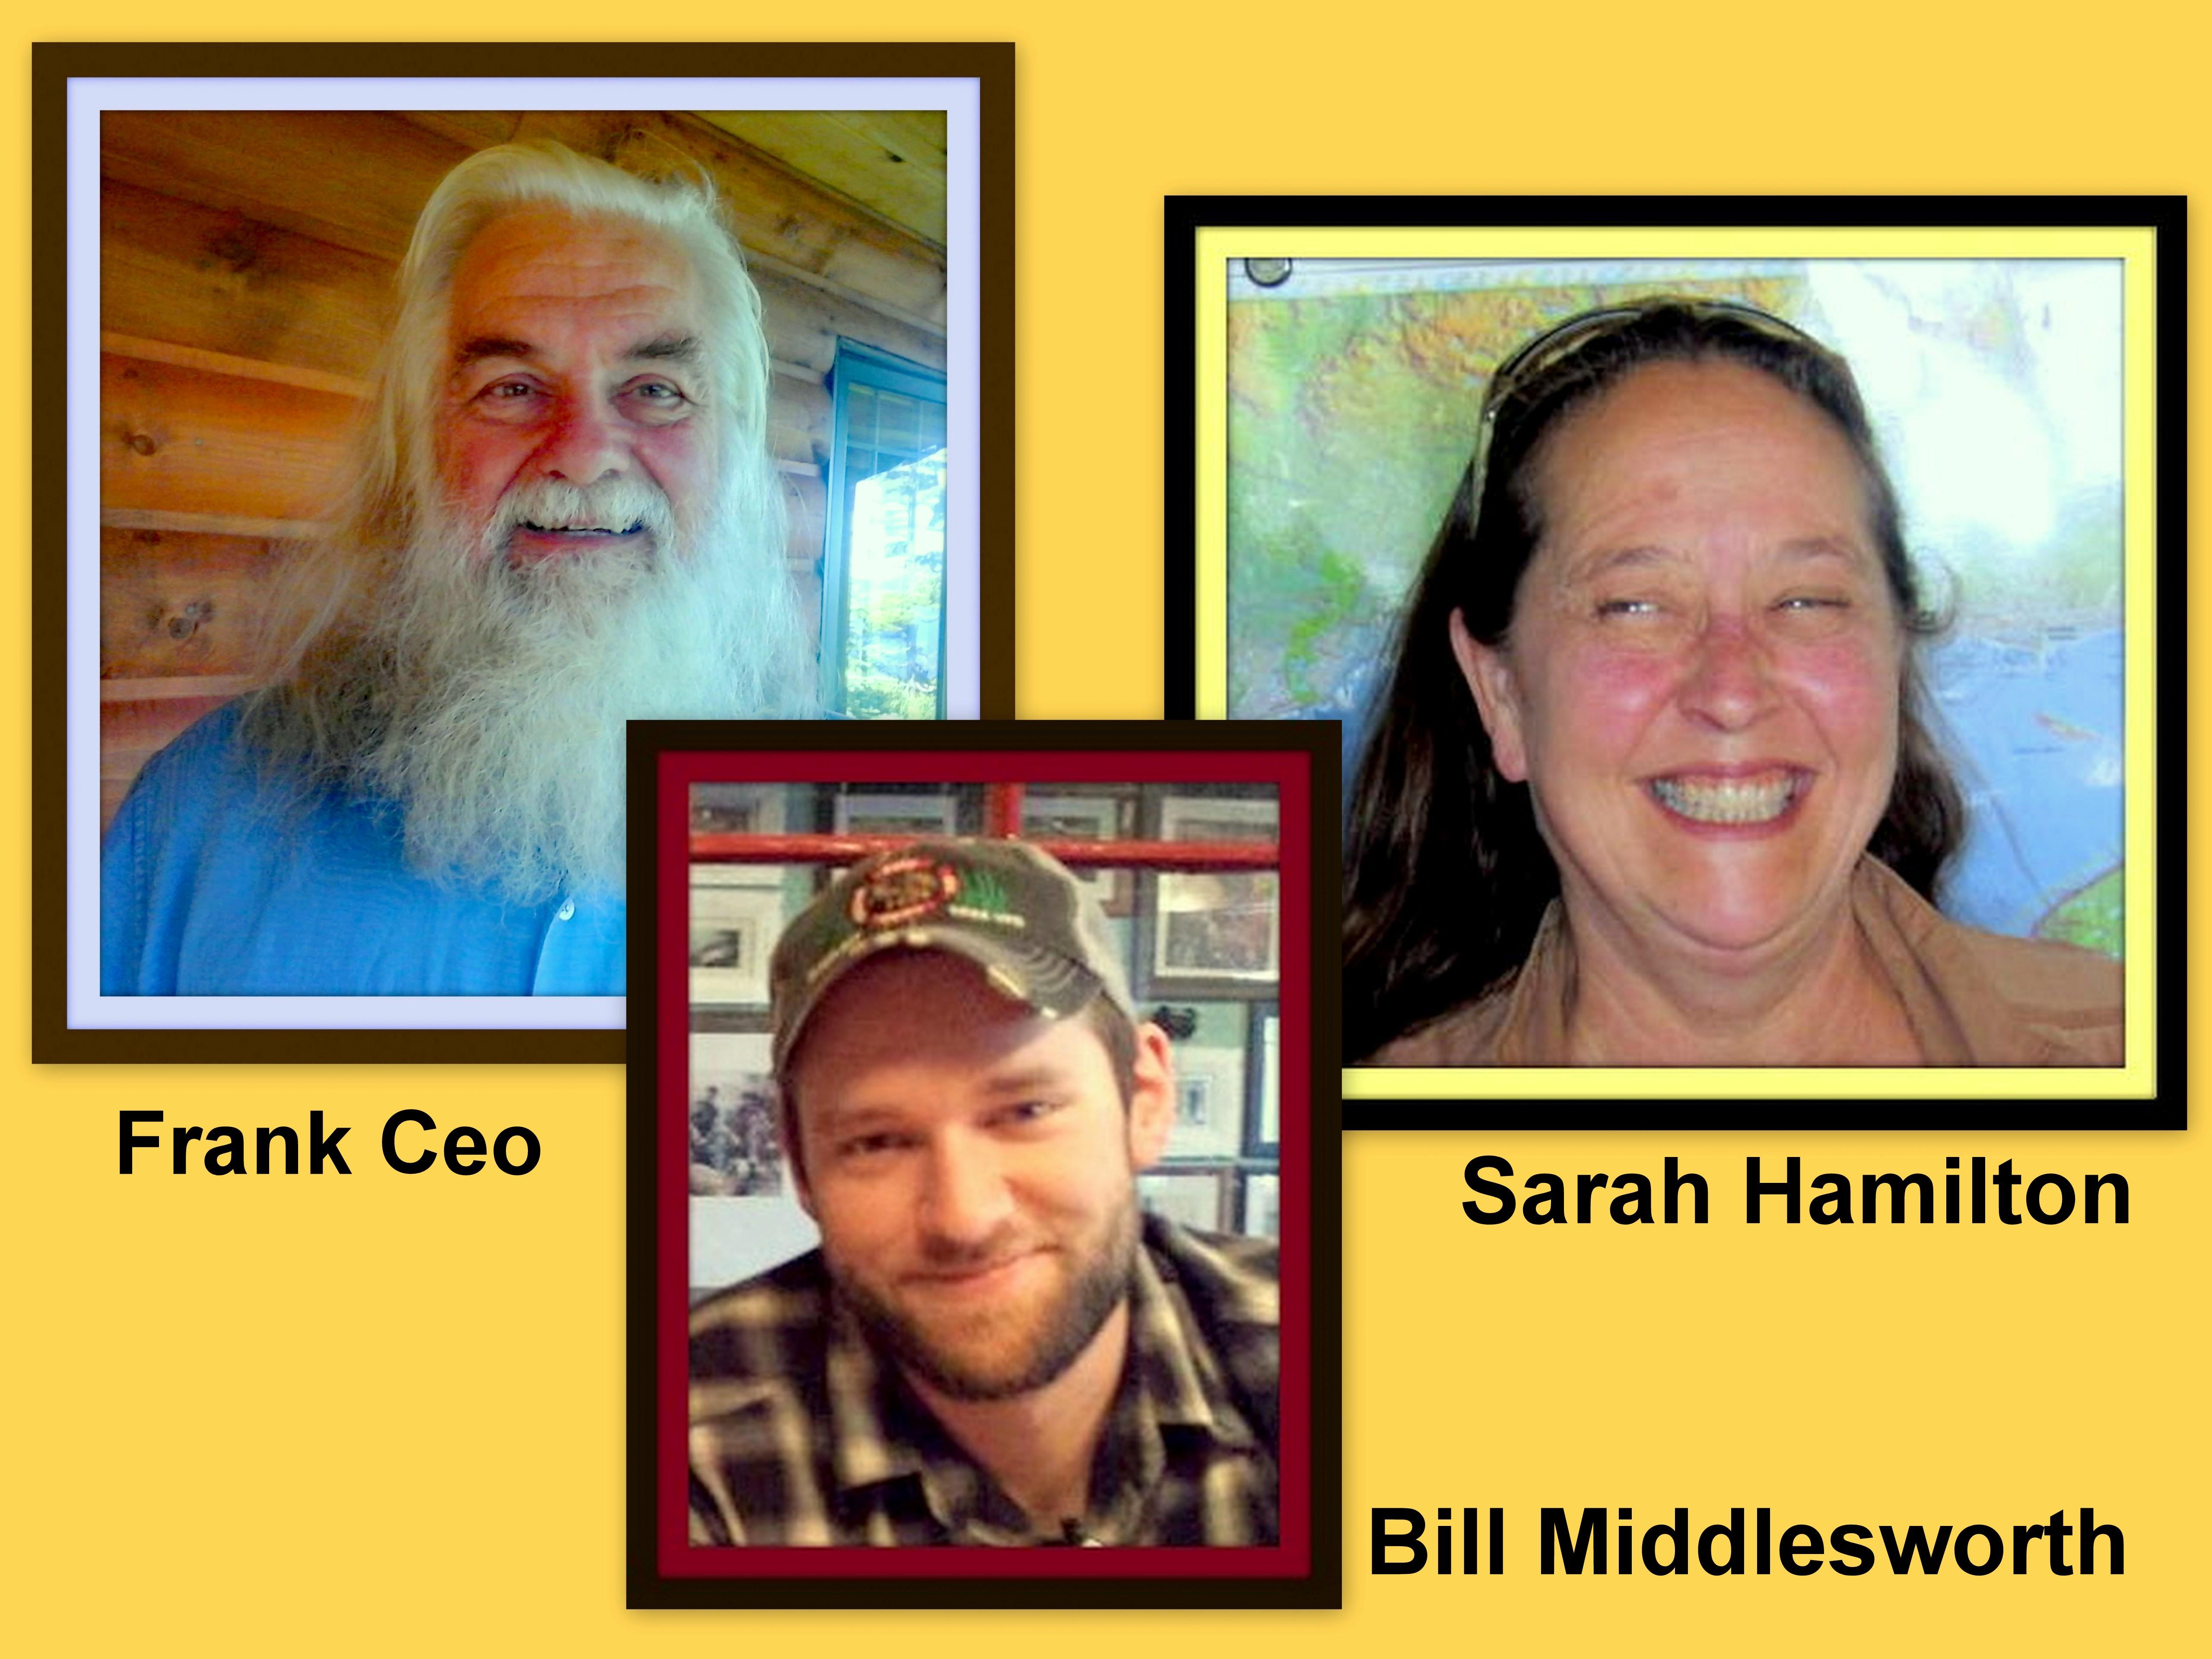 Frank Ceo, Bill Middlesworth, and Sarah Hamilton